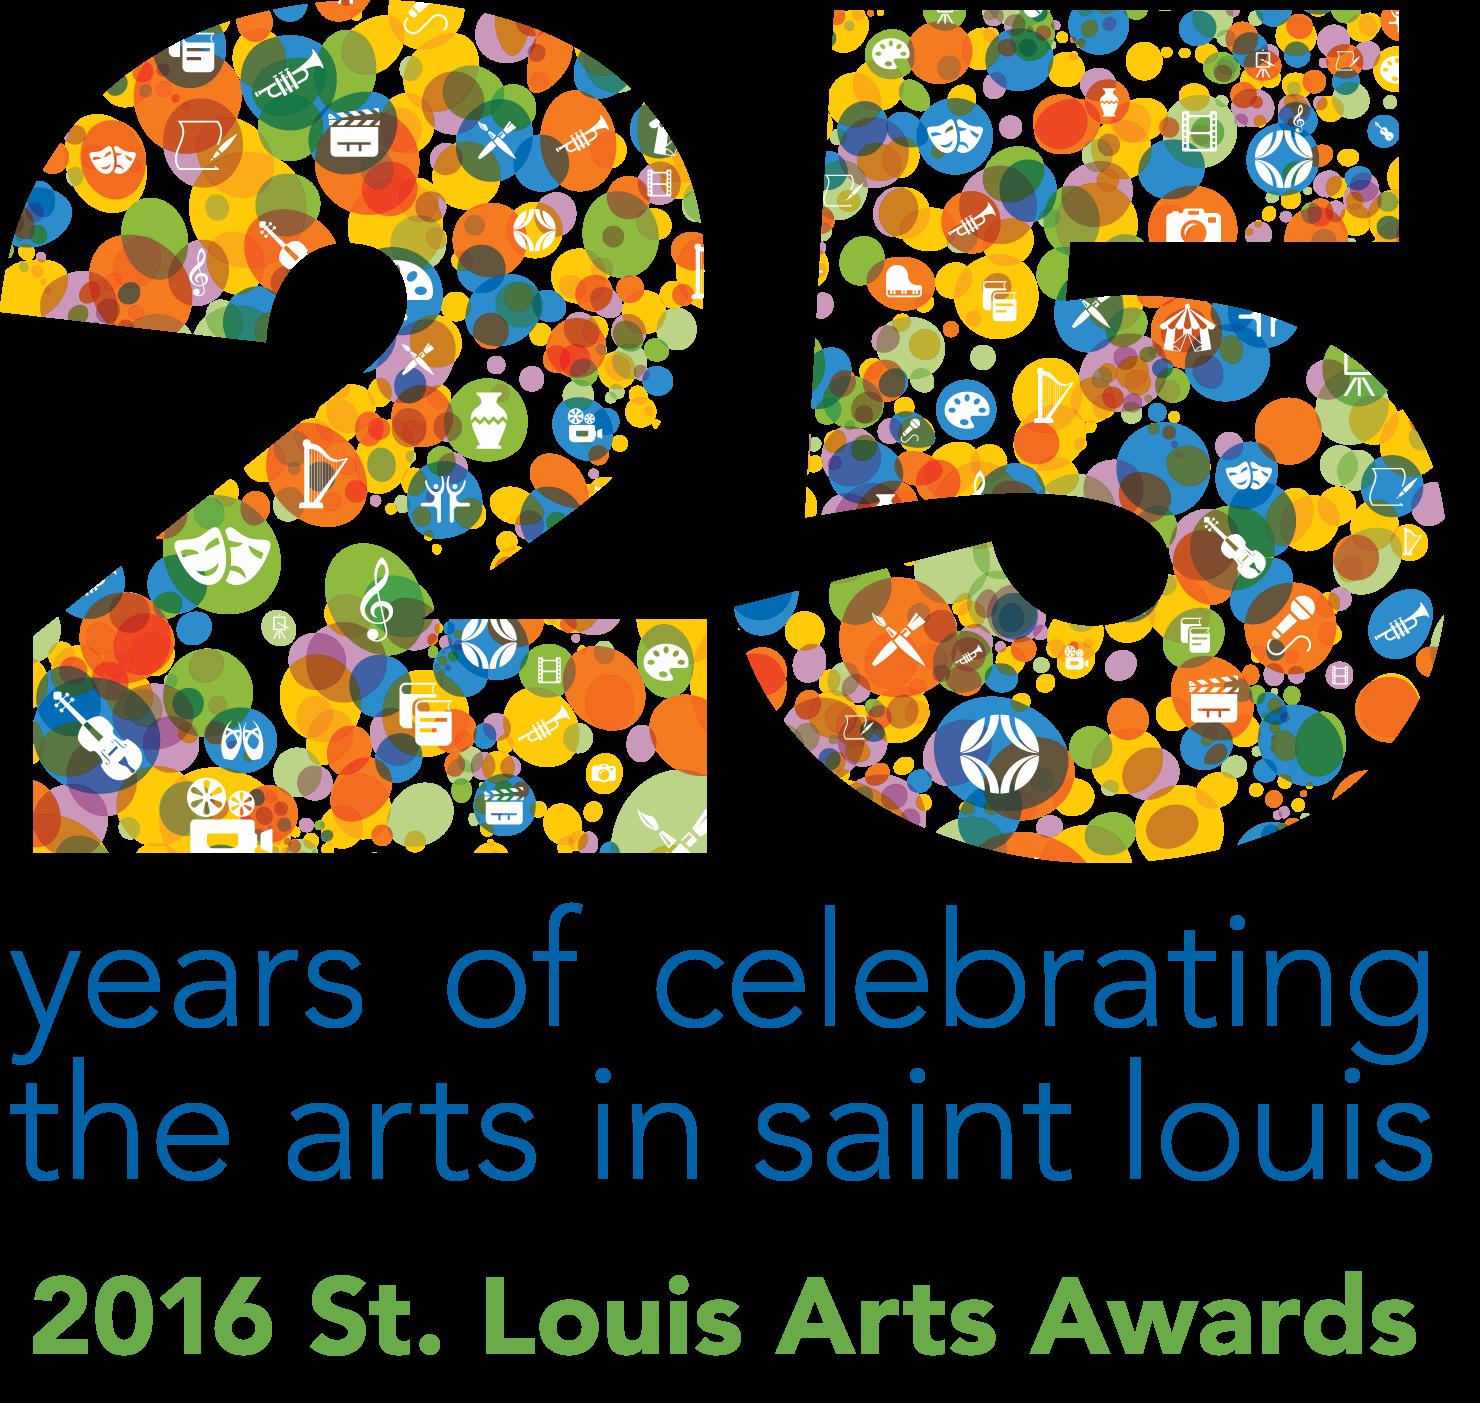 2016 St. Louis Arts Awards